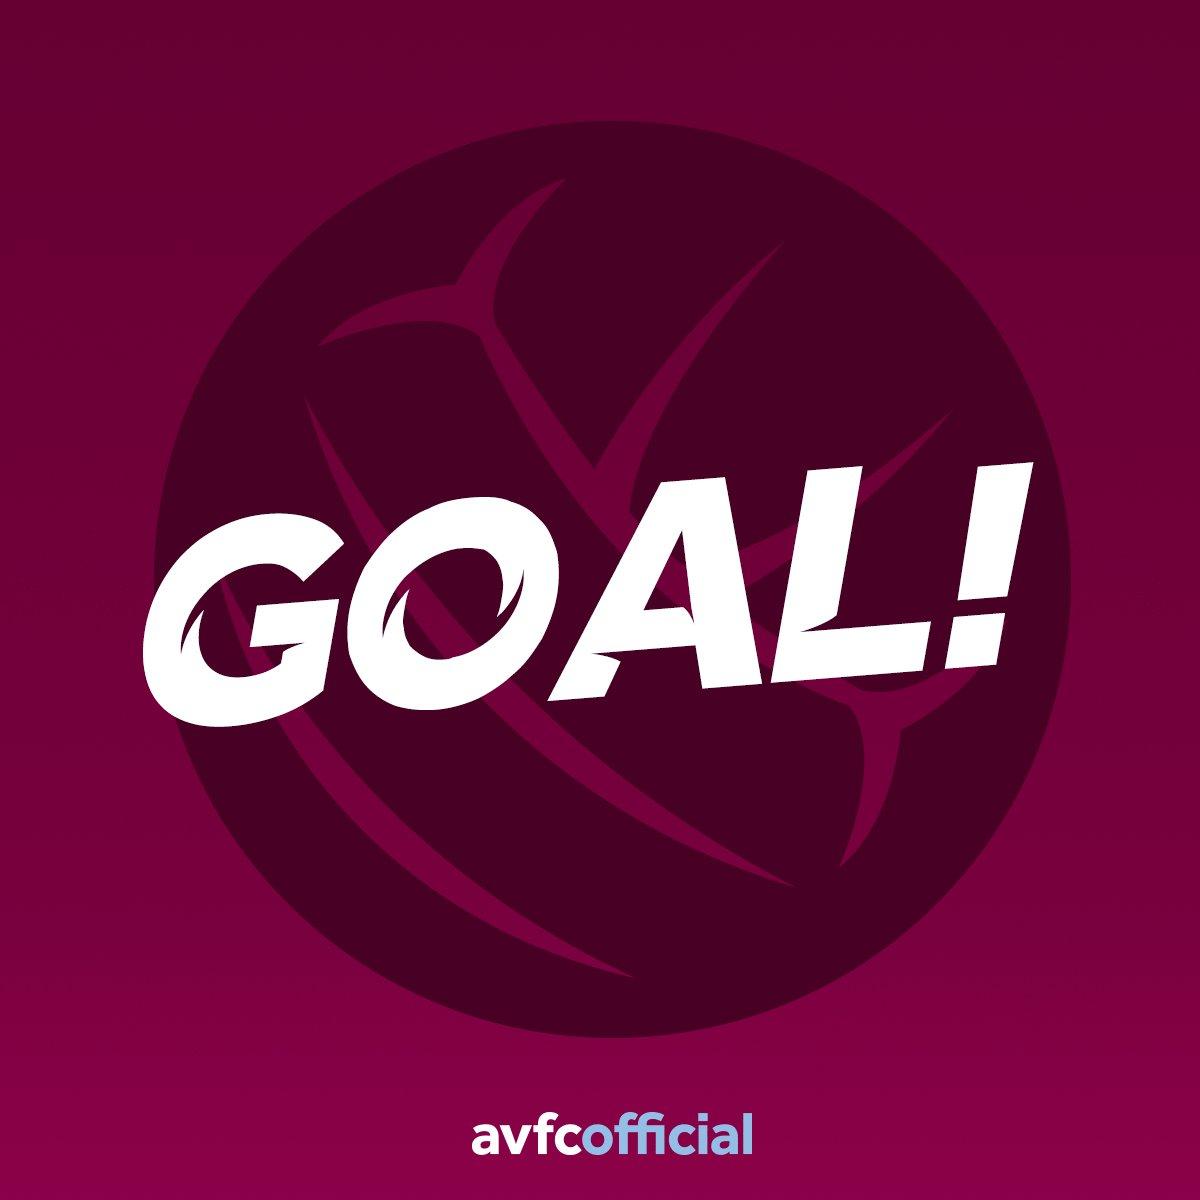 GOALLLLLLLL! Villa move the ball around neatly on the edge of the box, @LansburyHenri slides in Albert who neatly slots home into the bottom right hand corner! 2-0. 👉 bit.ly/2uQYUfC #PartOfThePride #AVFC